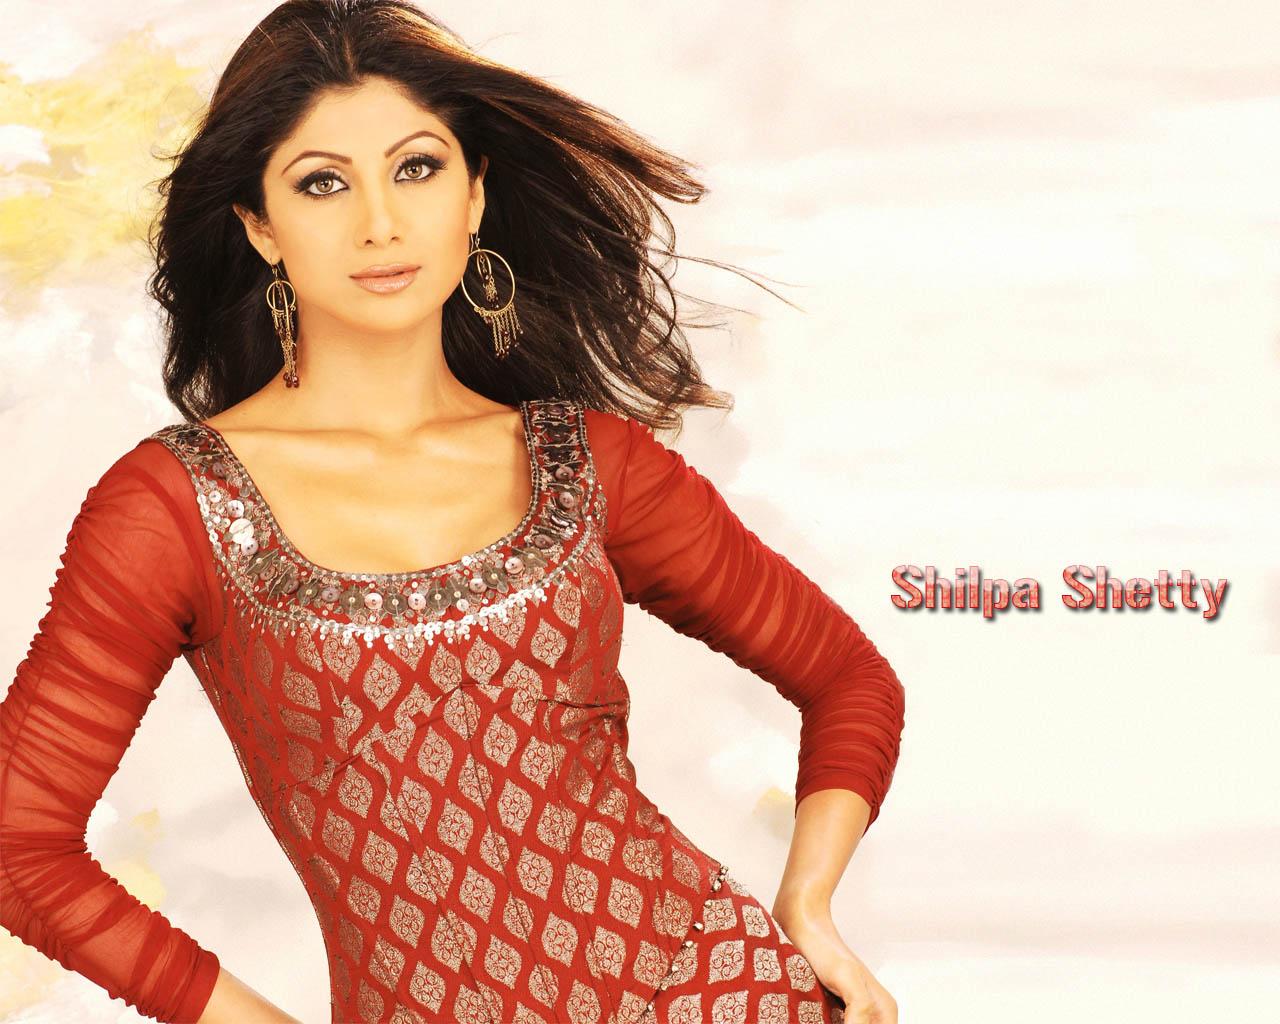 Shilpa Shetty Hot